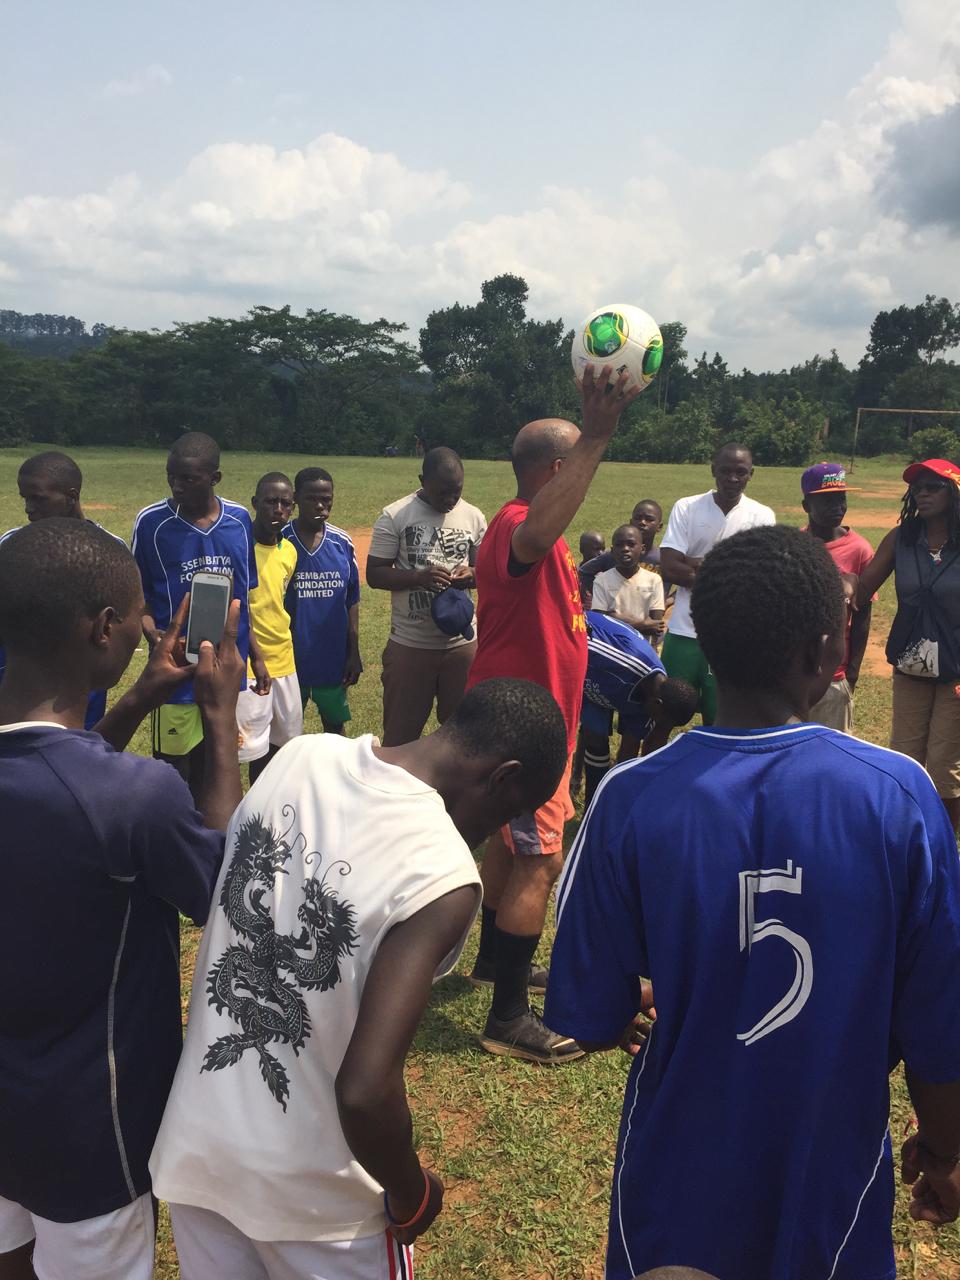 Pre-game instructions from Makinto—Team Rangers from Uganda vs. Team Joyful!